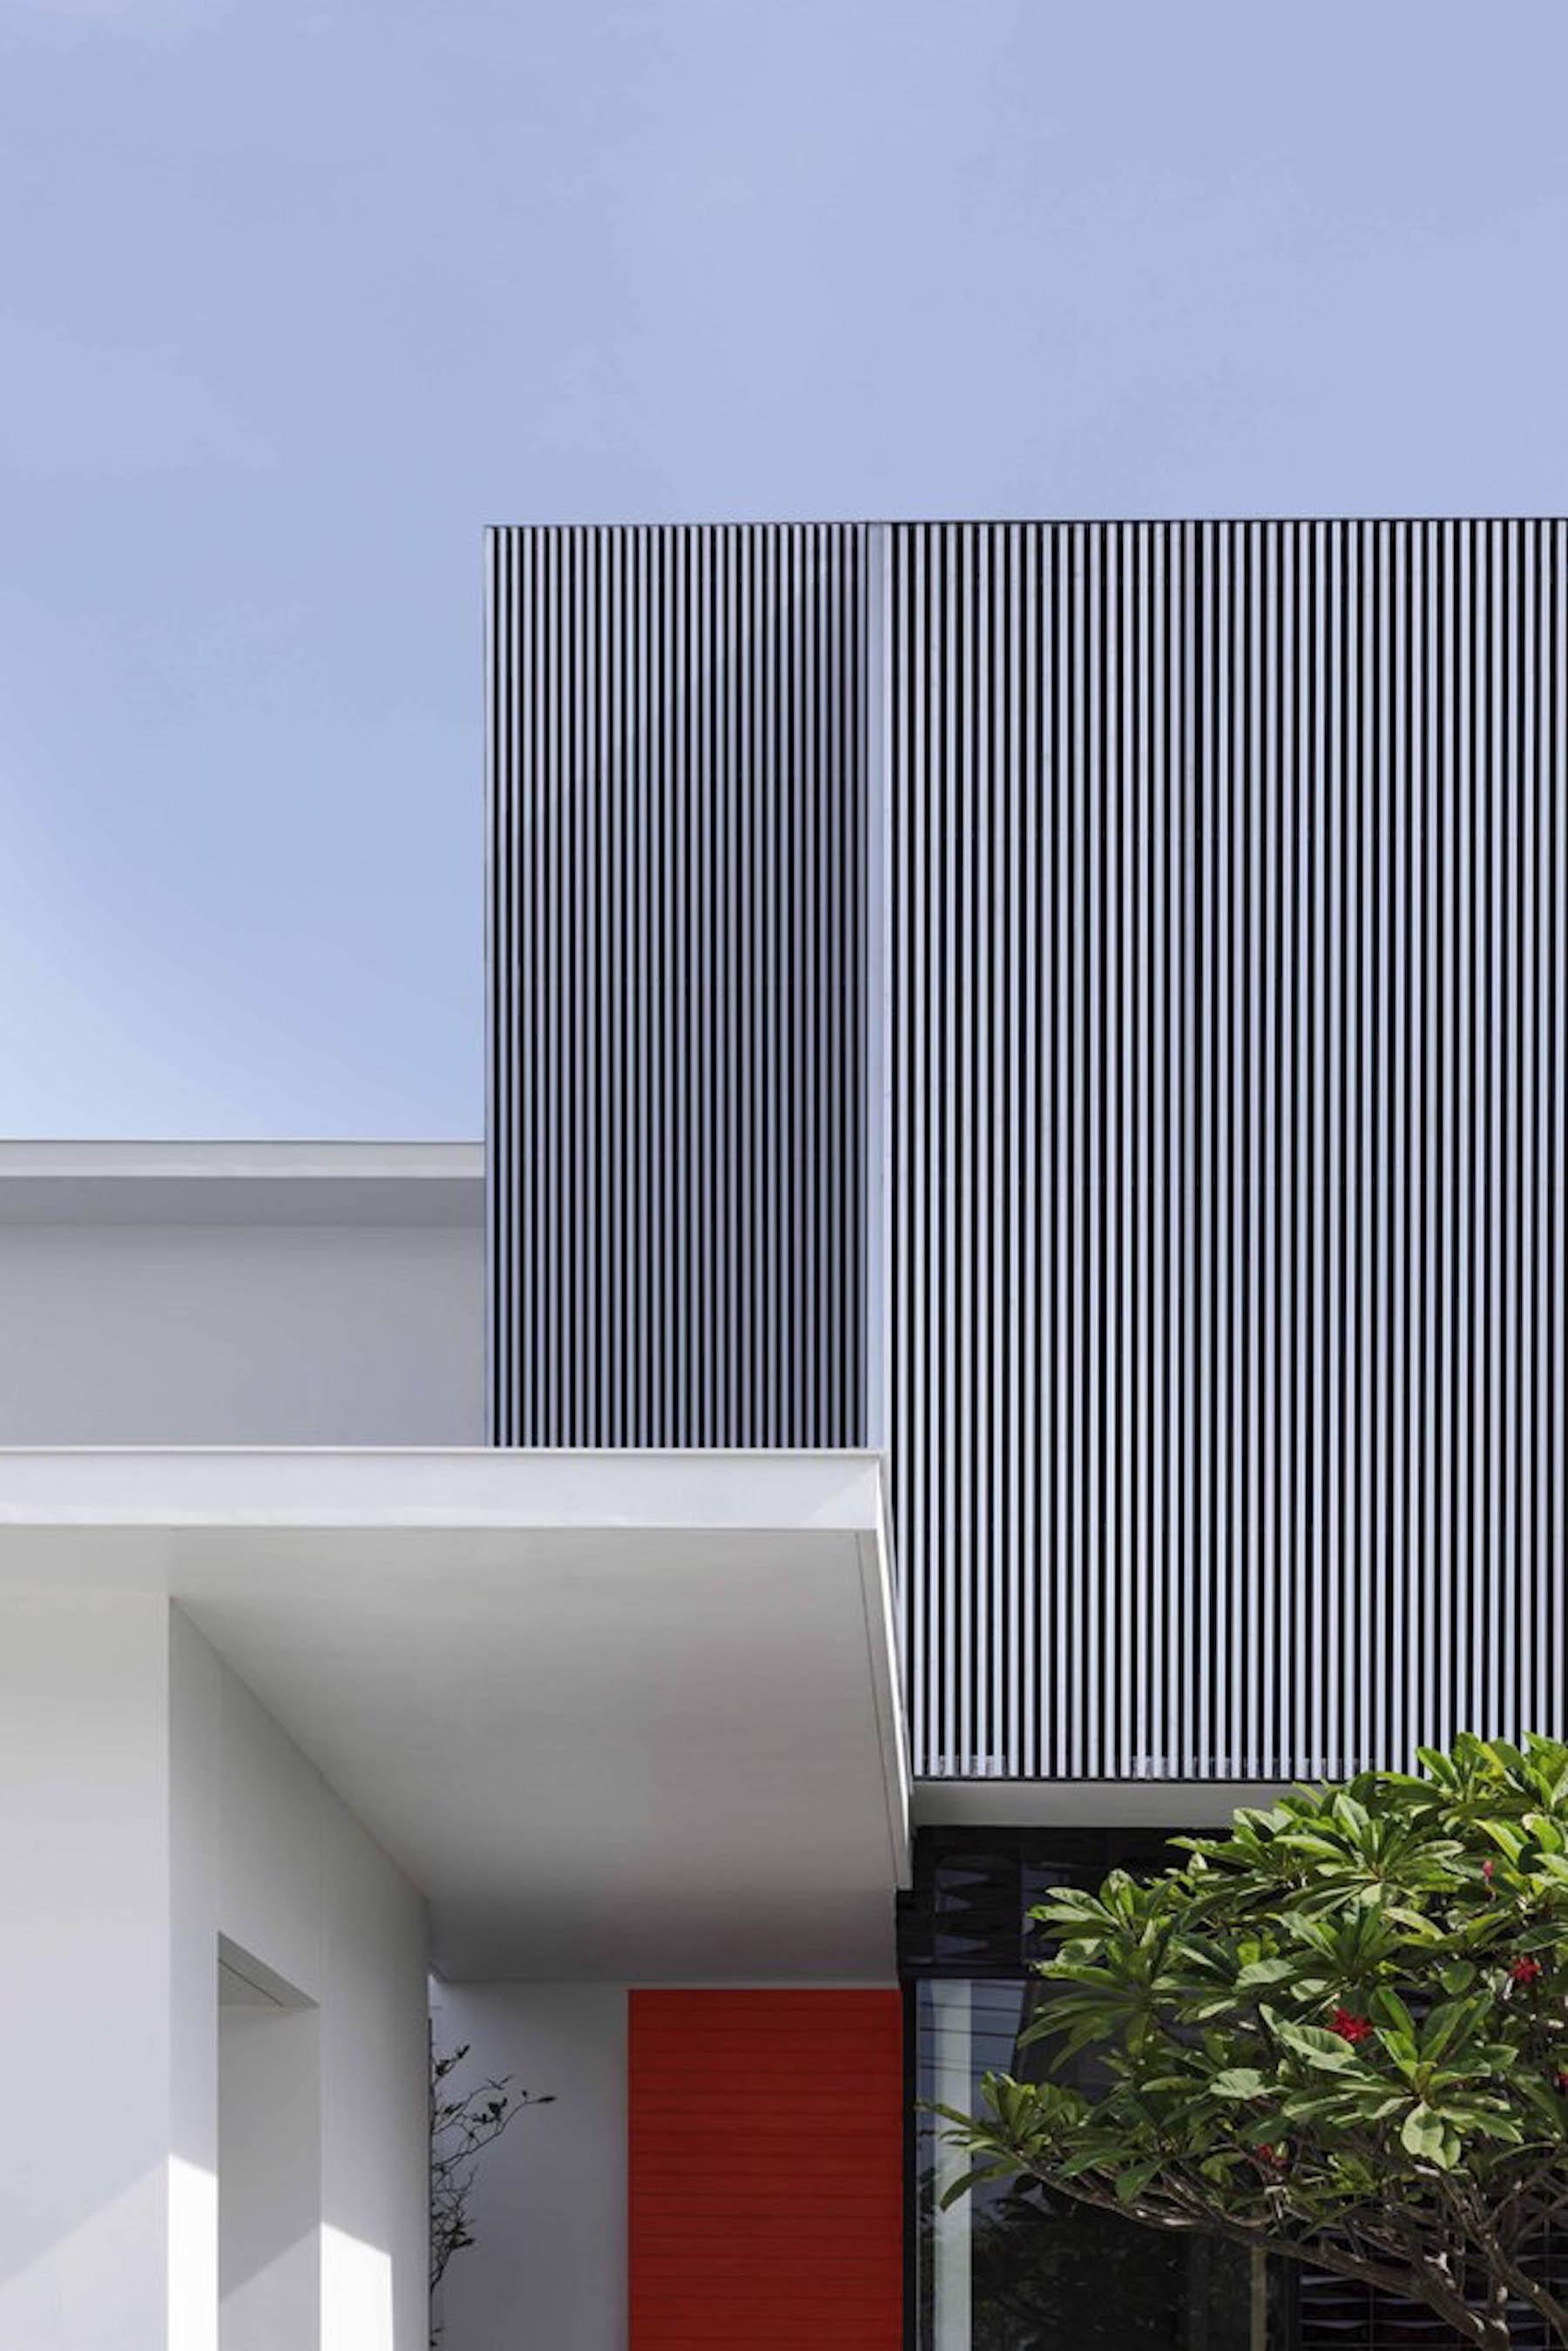 iGNANT-Architecture-Ayutt-And-Associates-Design-White-Box-House-11